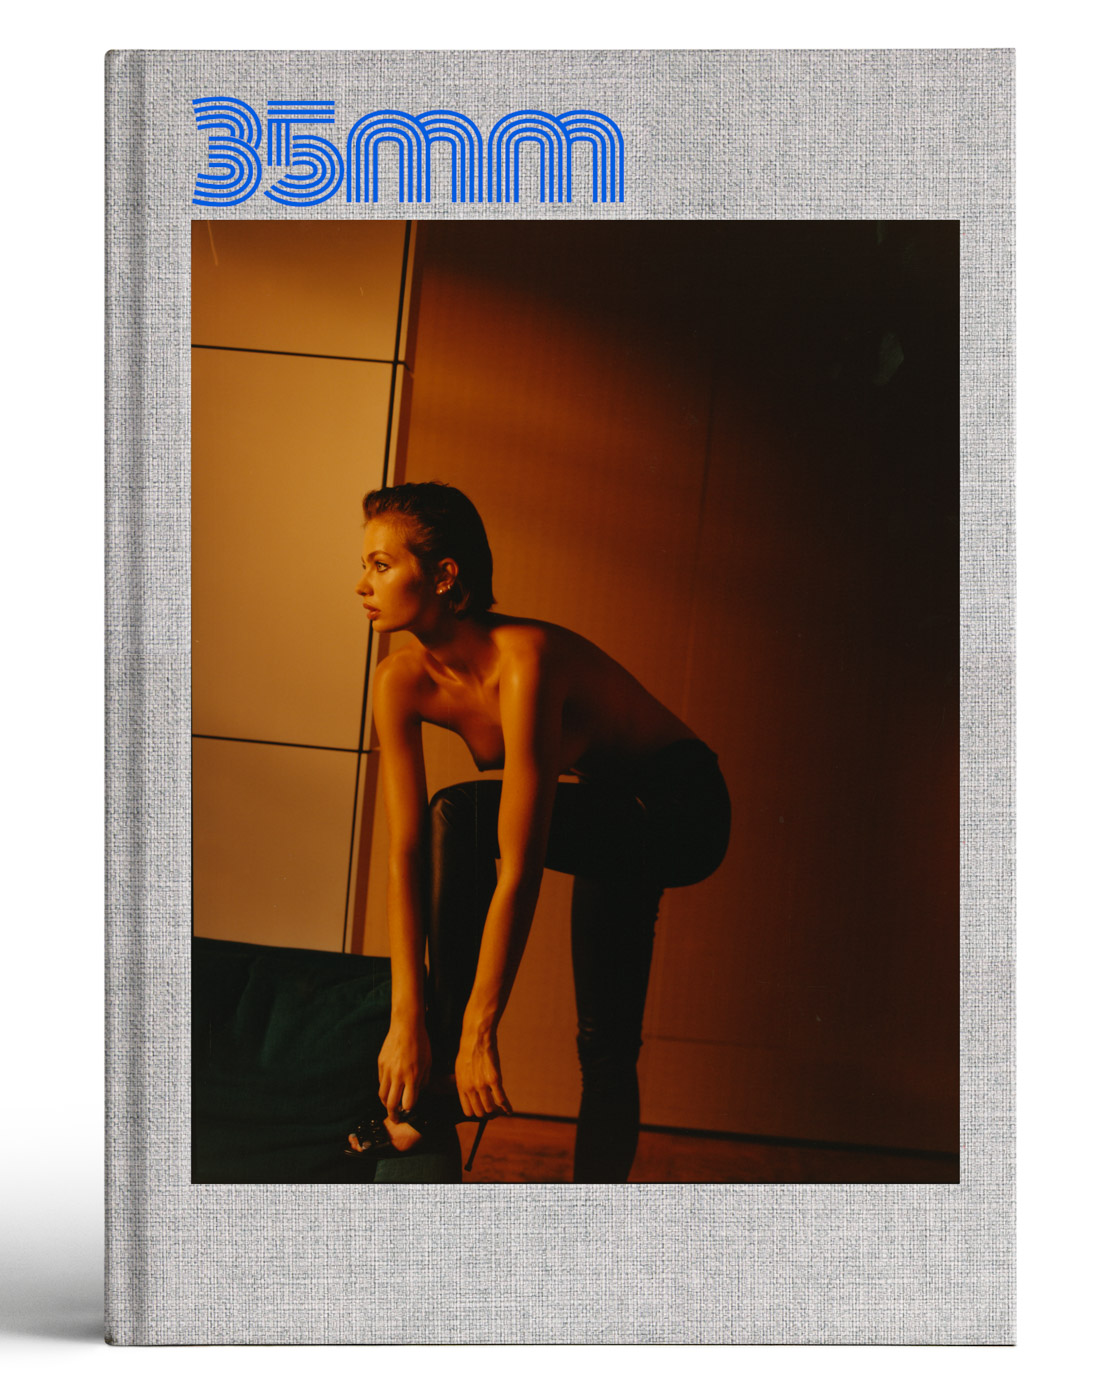 35mm_magazine_book_issue_film_only15.jpg